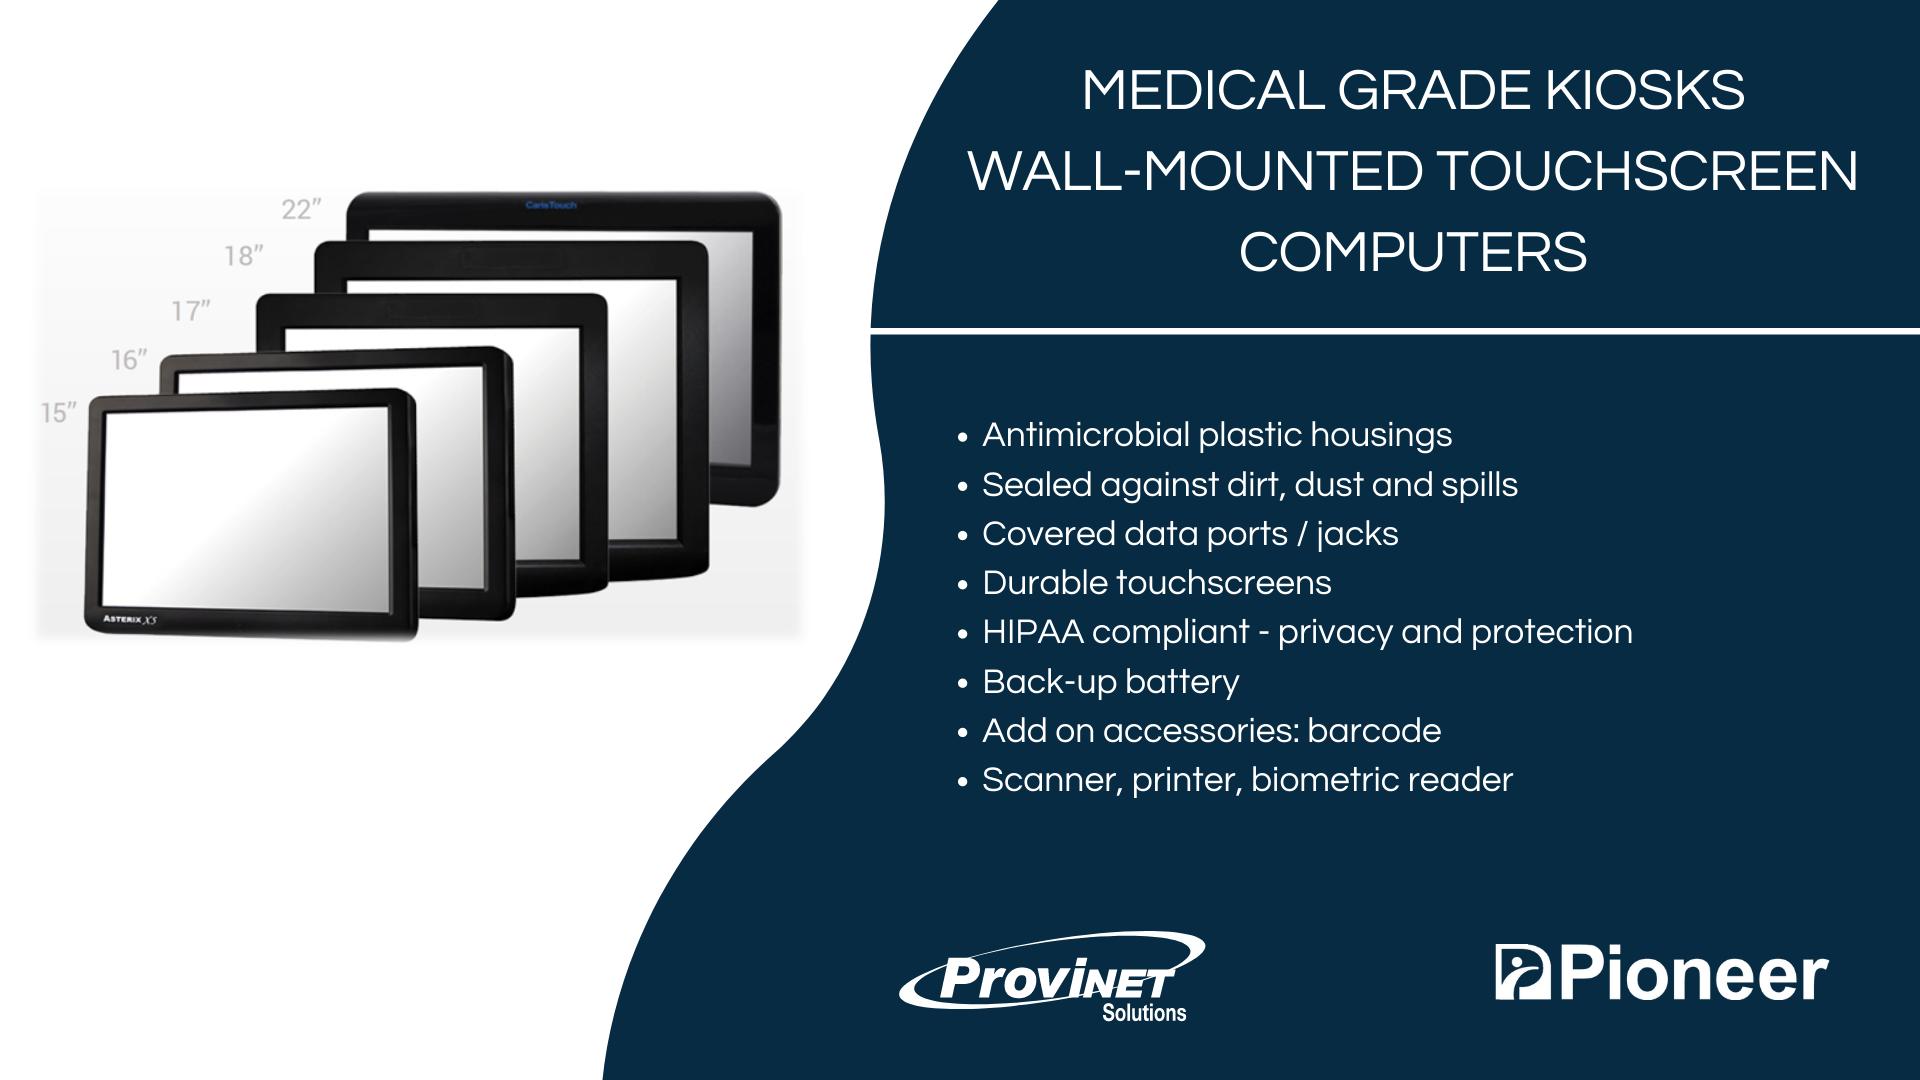 Medical Grade Kiosks Wall-Mounted Touchscreen Computers